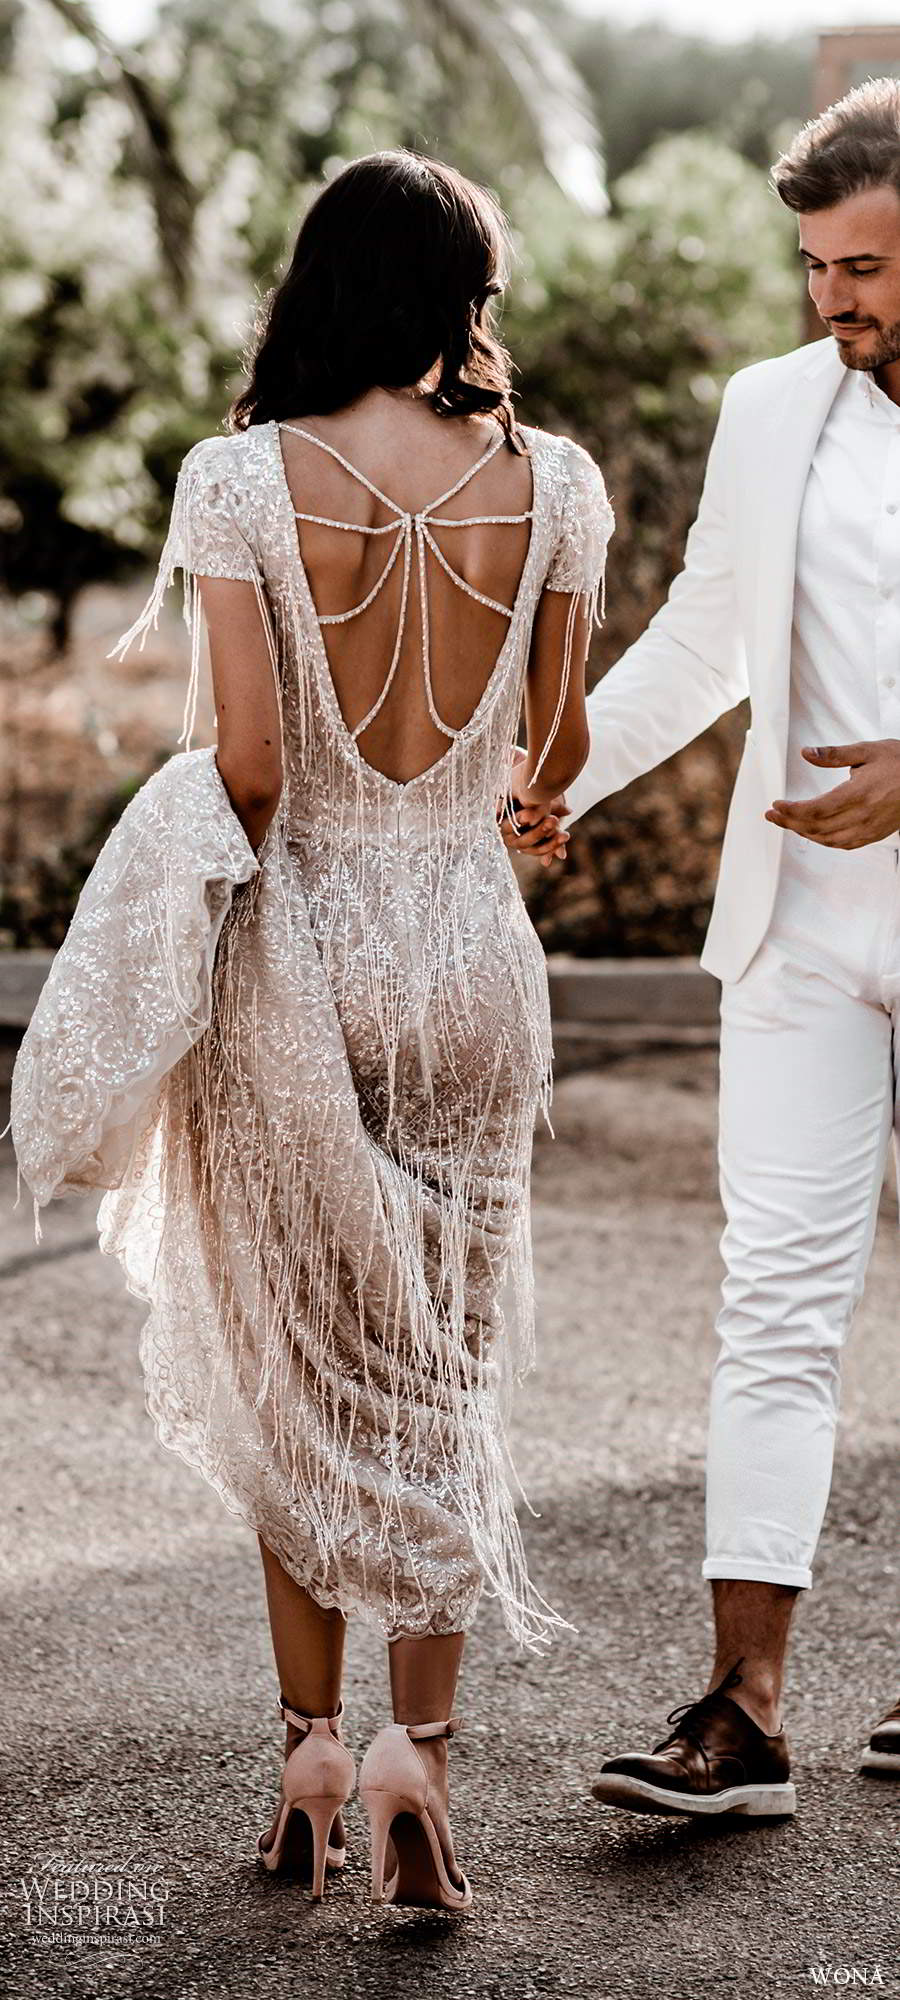 wona fall 2020 bridal short sleeves v neckline fully embellished beaded fringe sheath wedding dress low scoop back chapel train (7) bv